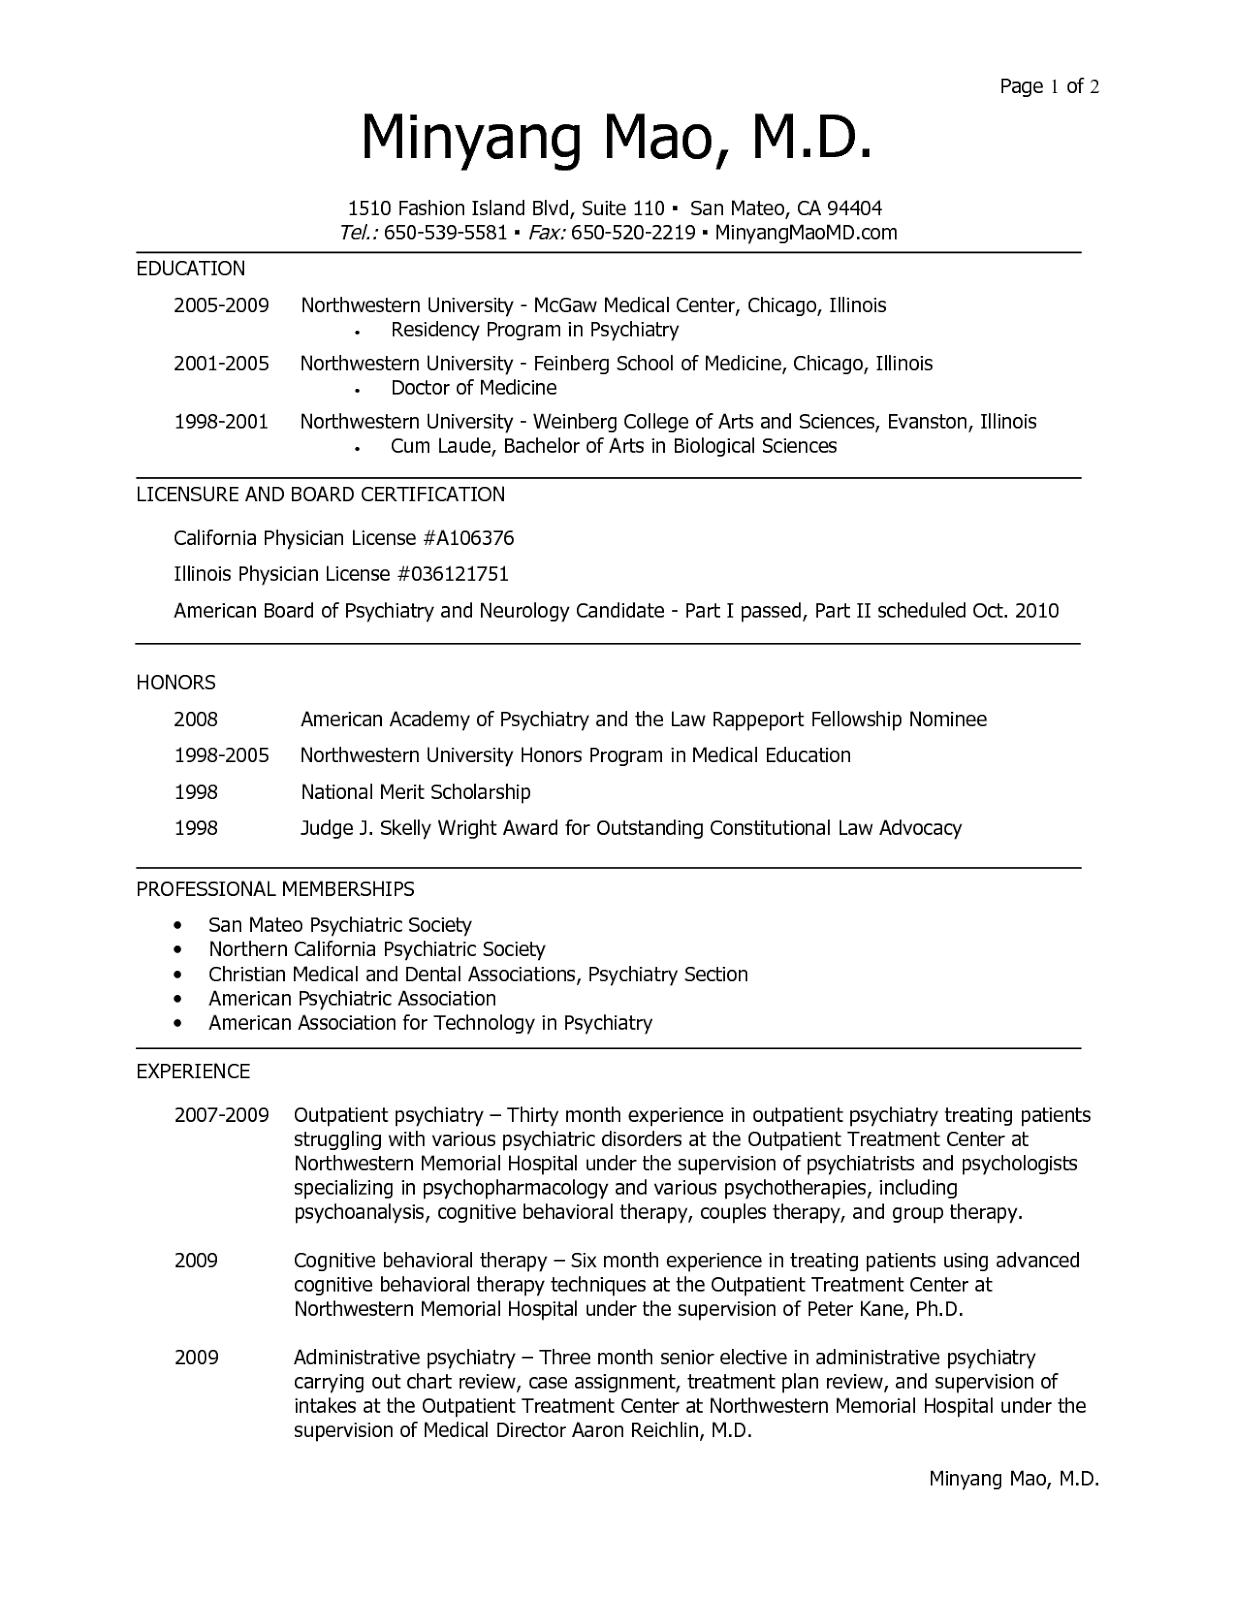 Free Resume Templates Healthcare Free Resume Templates Pinterest